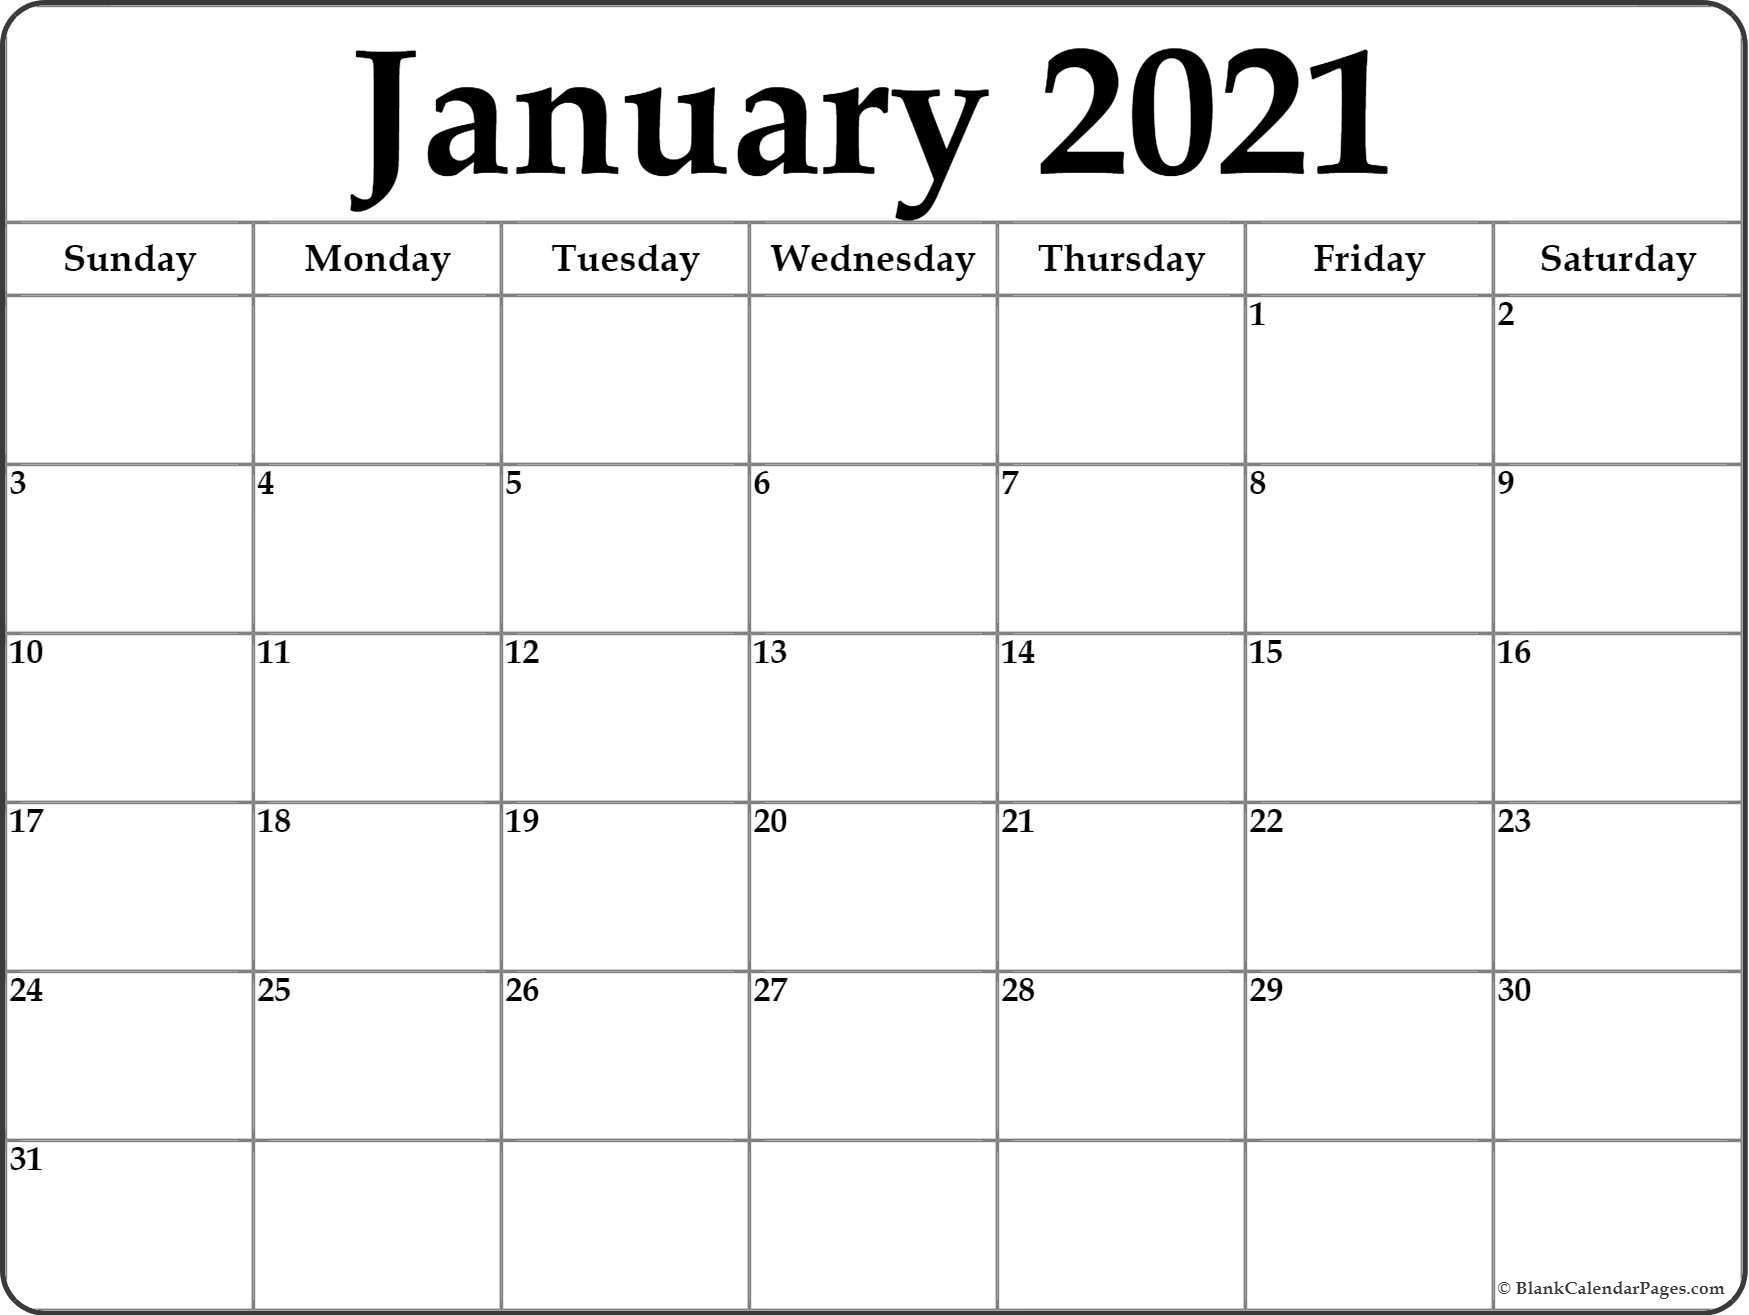 January 2021 Calendar   Free Printable Monthly Calendars-Free Monthly Calendar Printable 2021